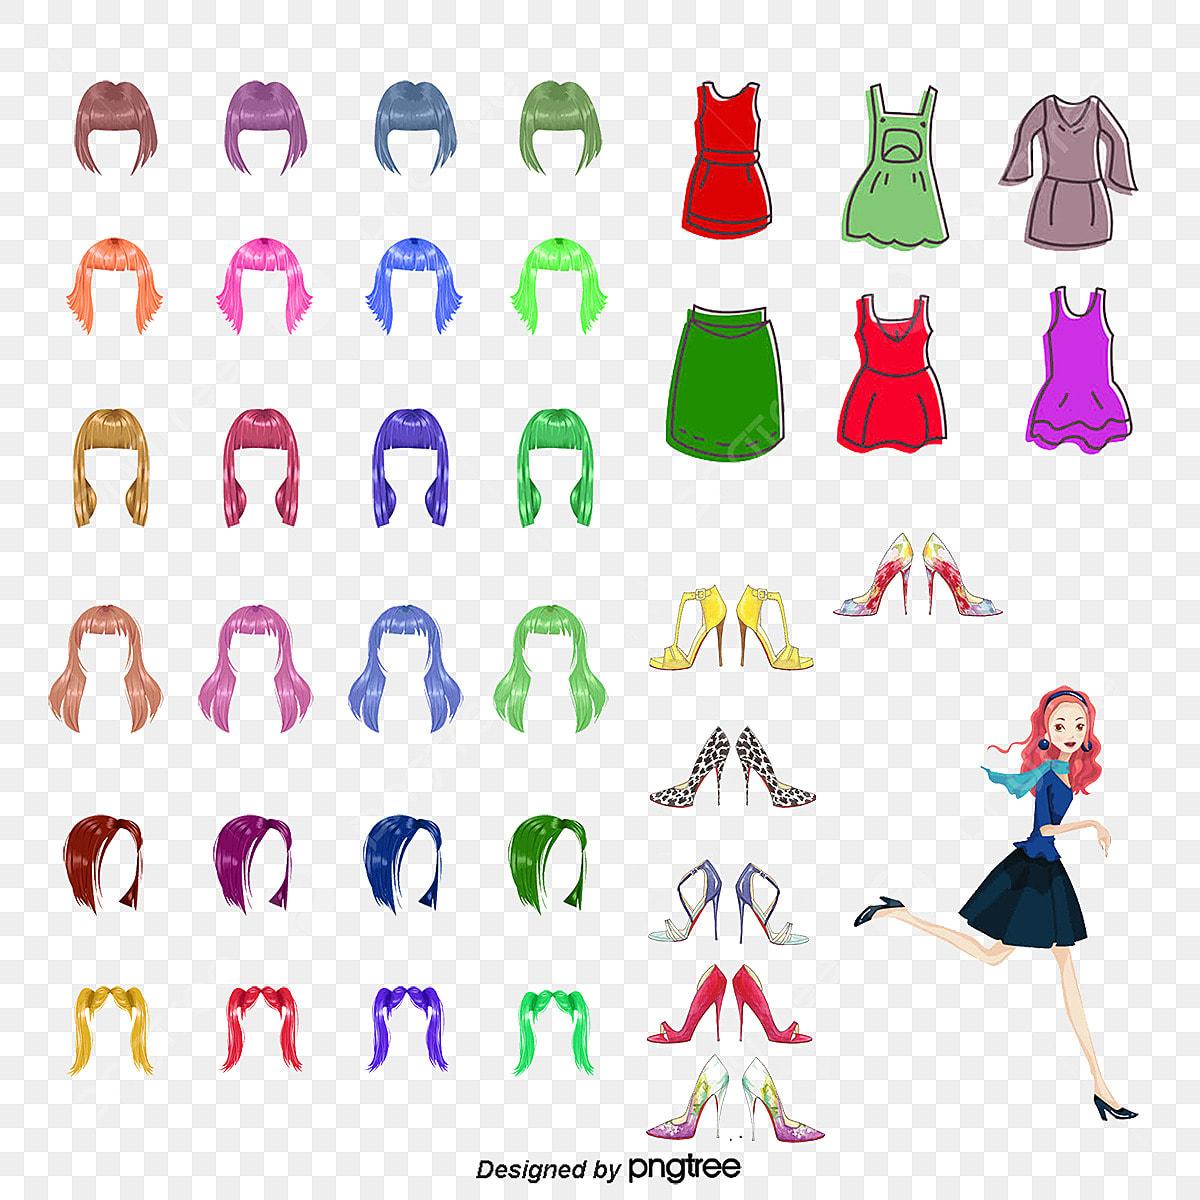 Khaki Dress Barbie Muñeca Barbie Juegos De Vestir Moda